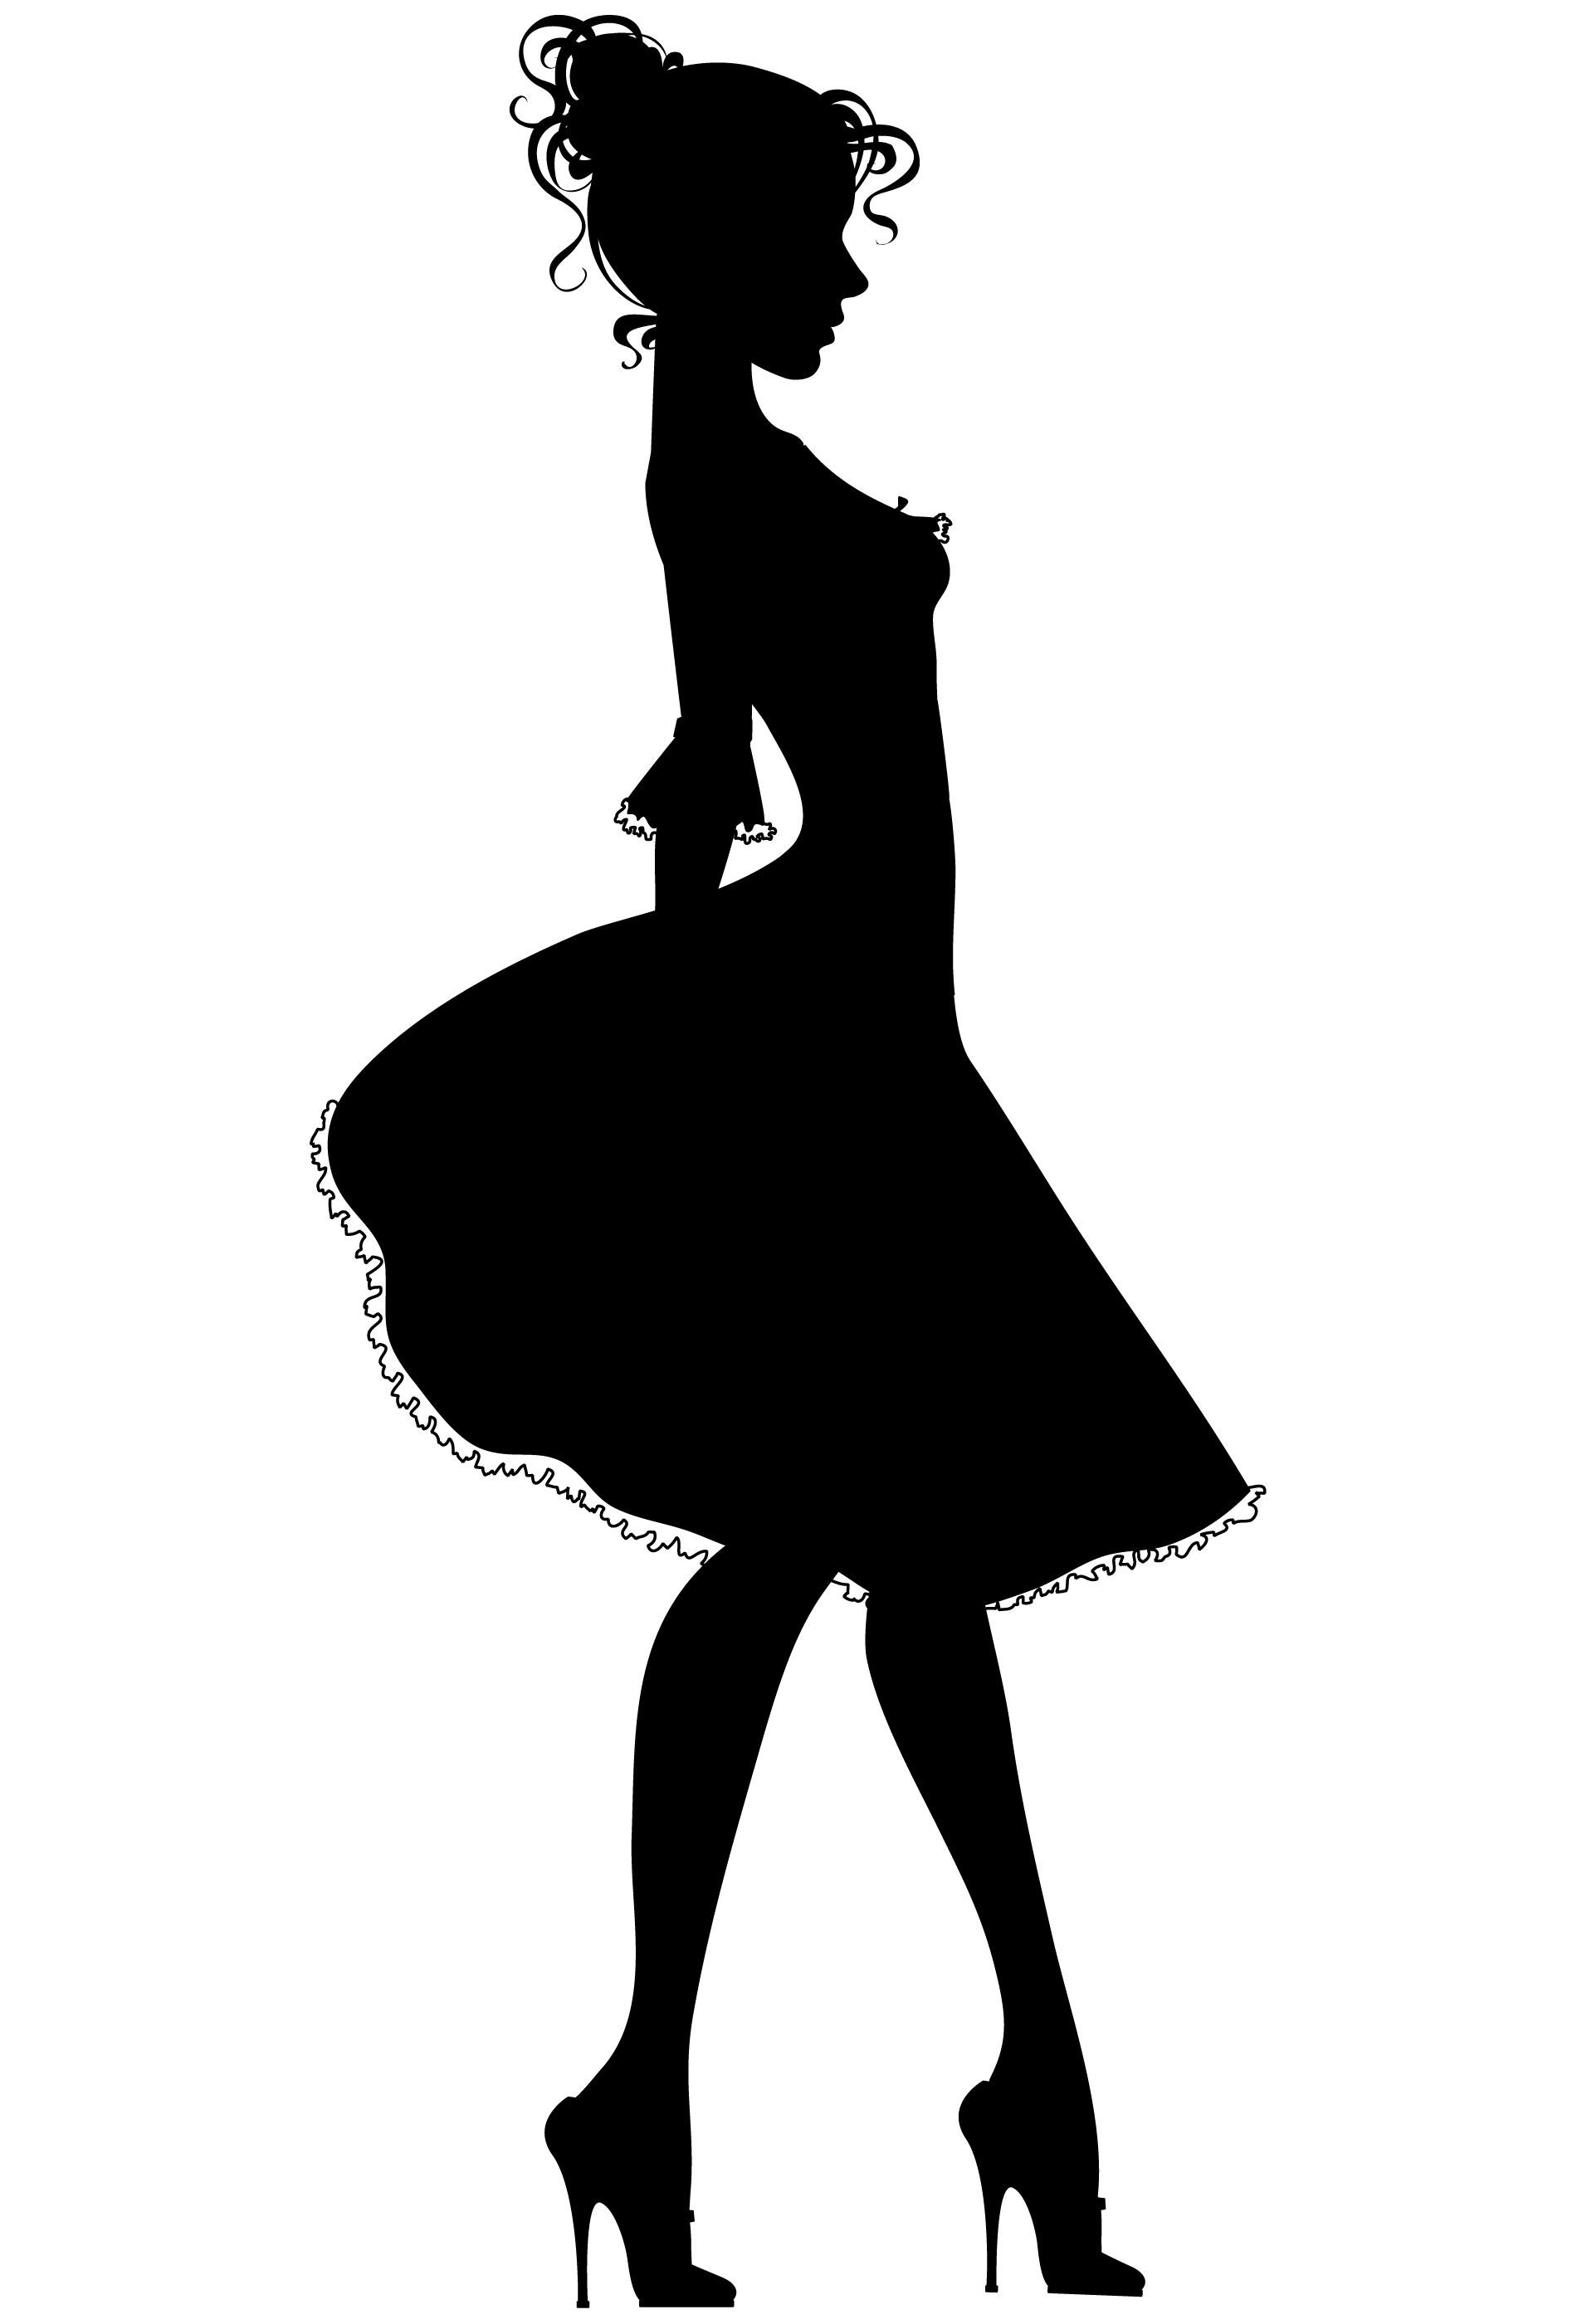 Woman Silhouette On Pinterest